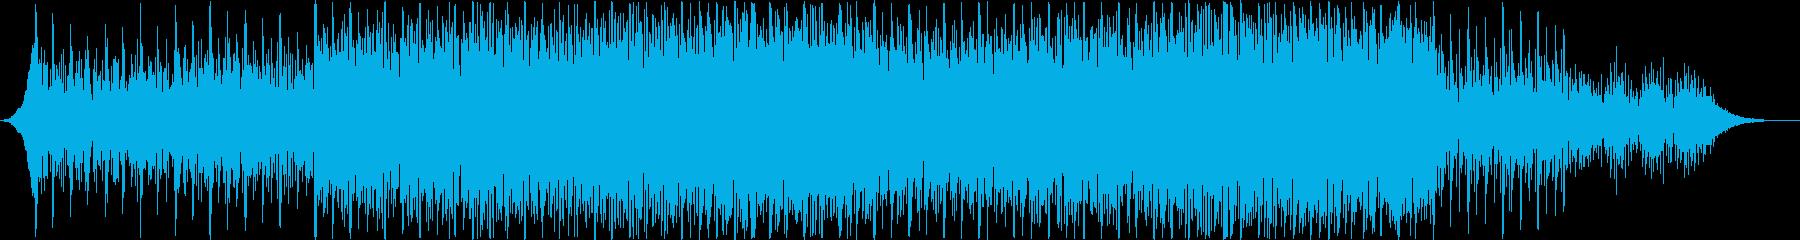 EDM映画やアニメのシリアスな場面向けの再生済みの波形